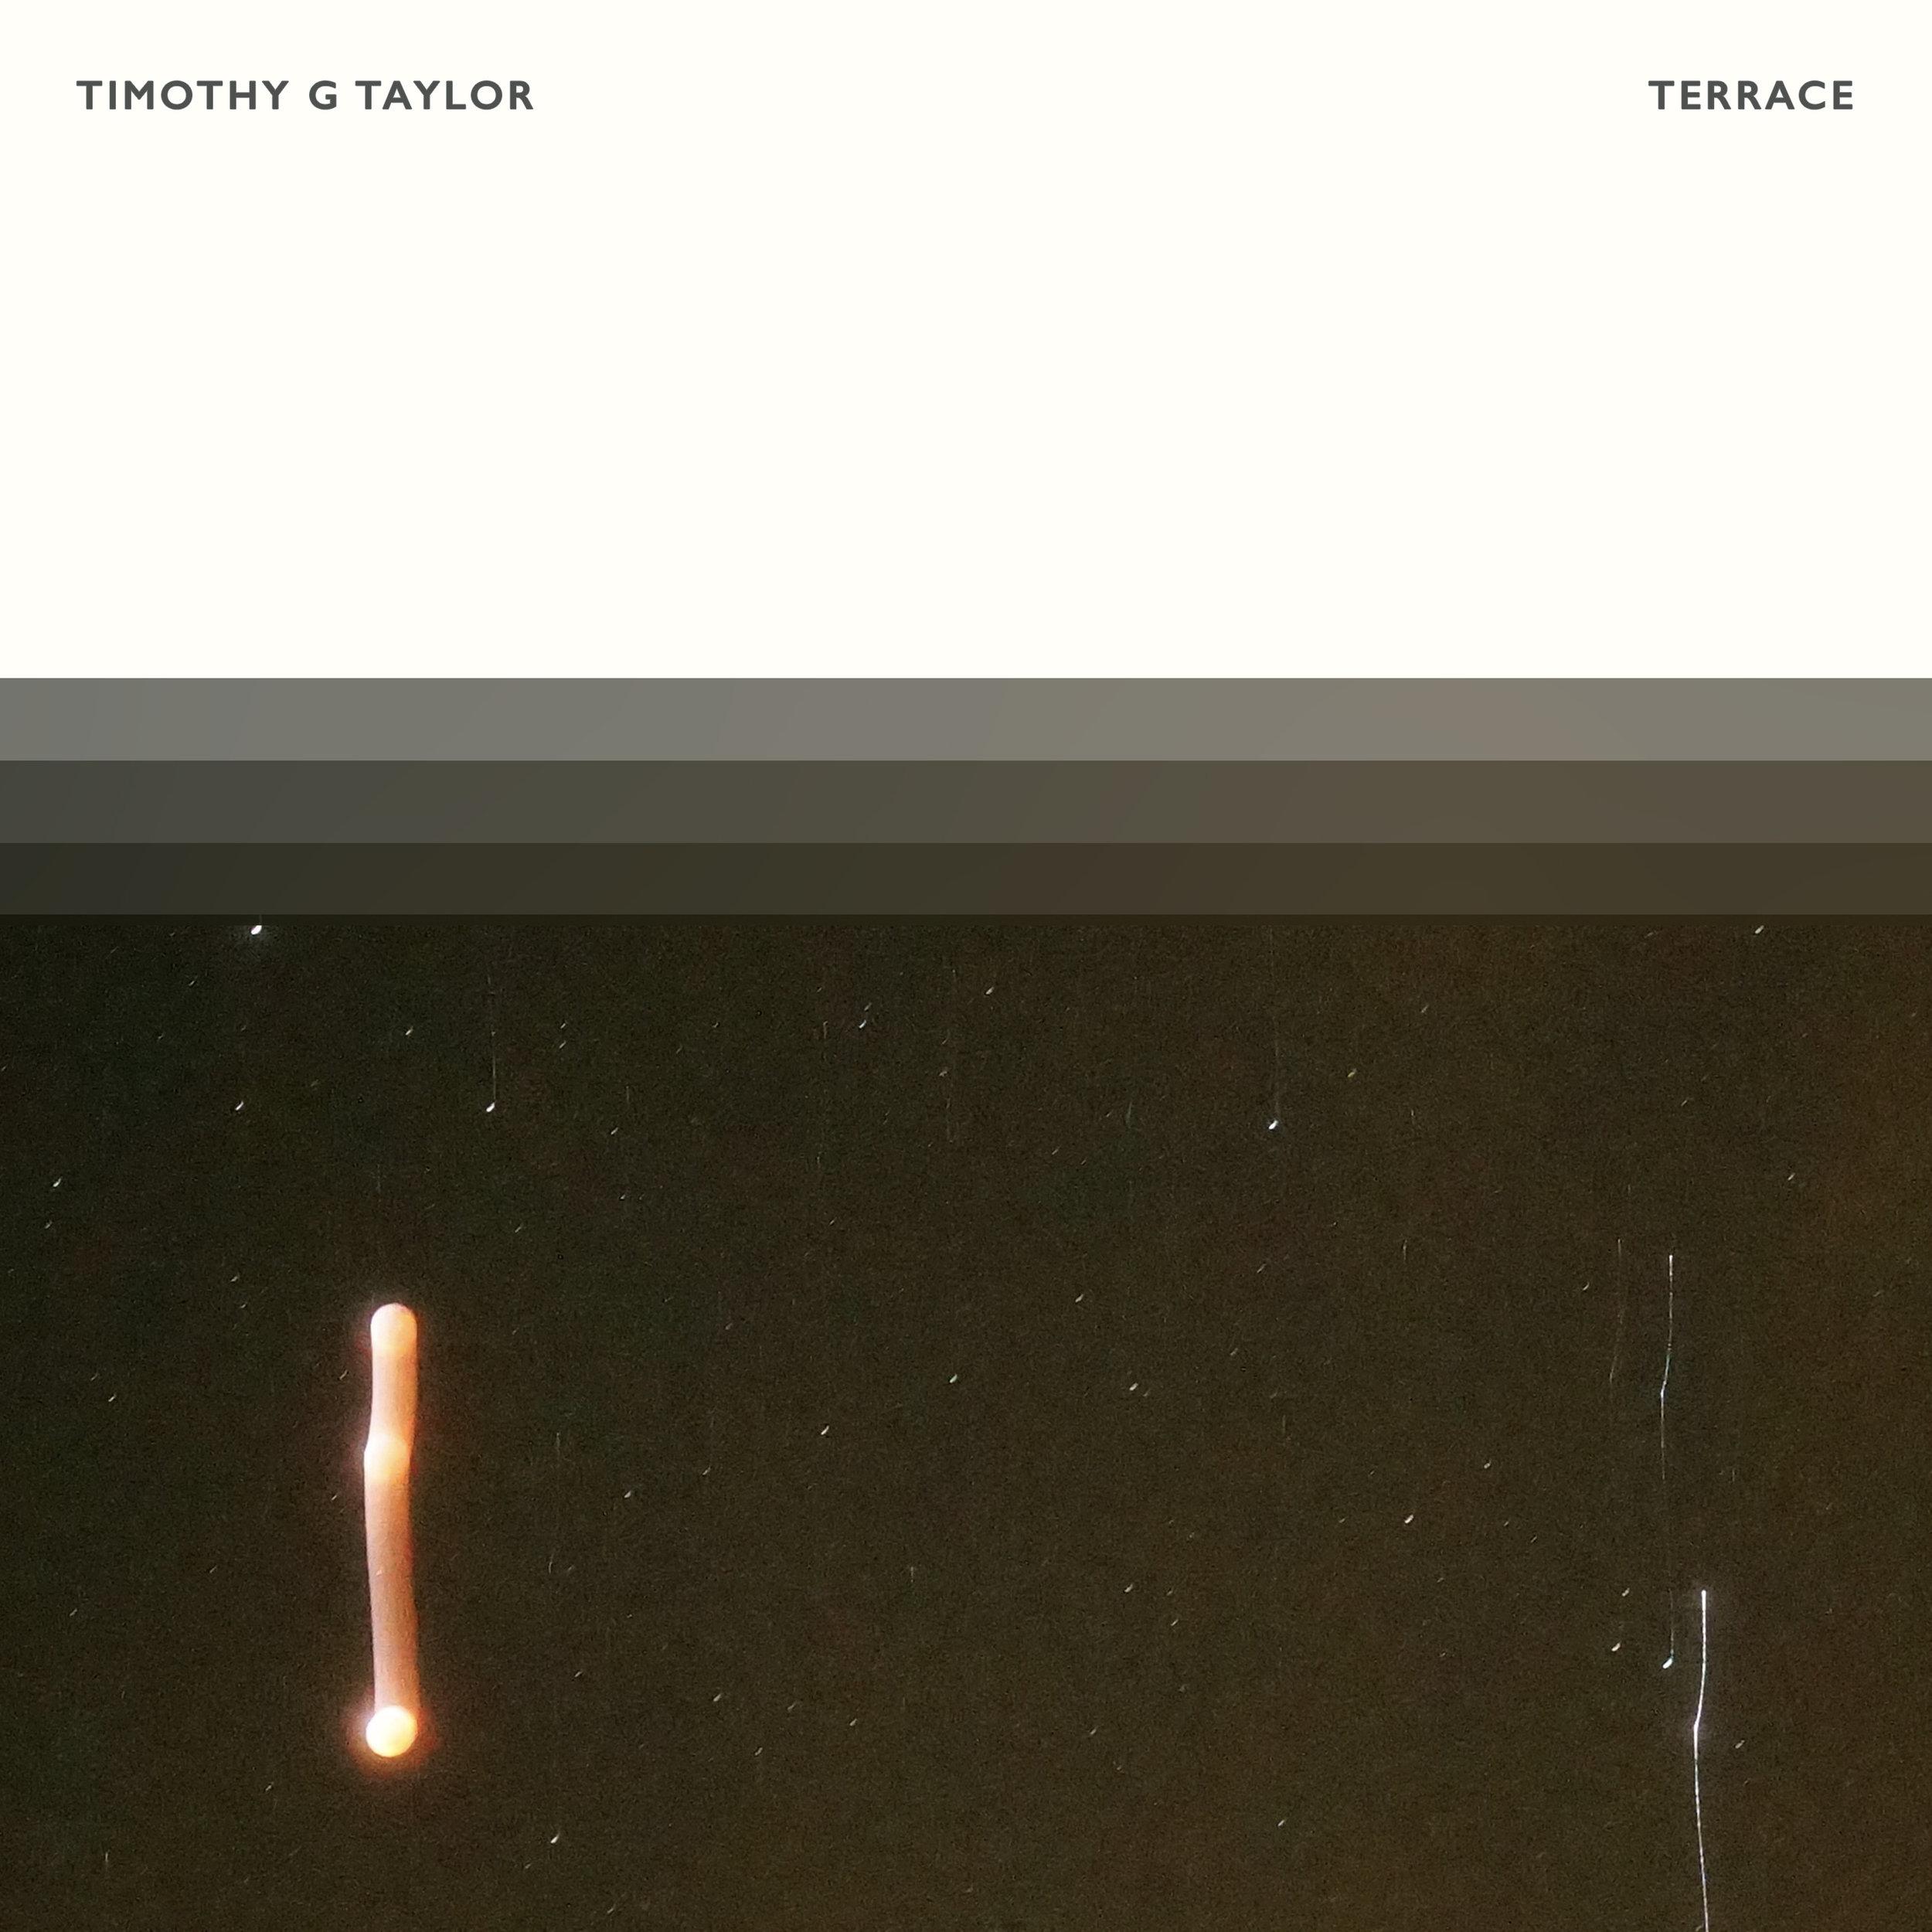 Timothy G Taylor - Terrace